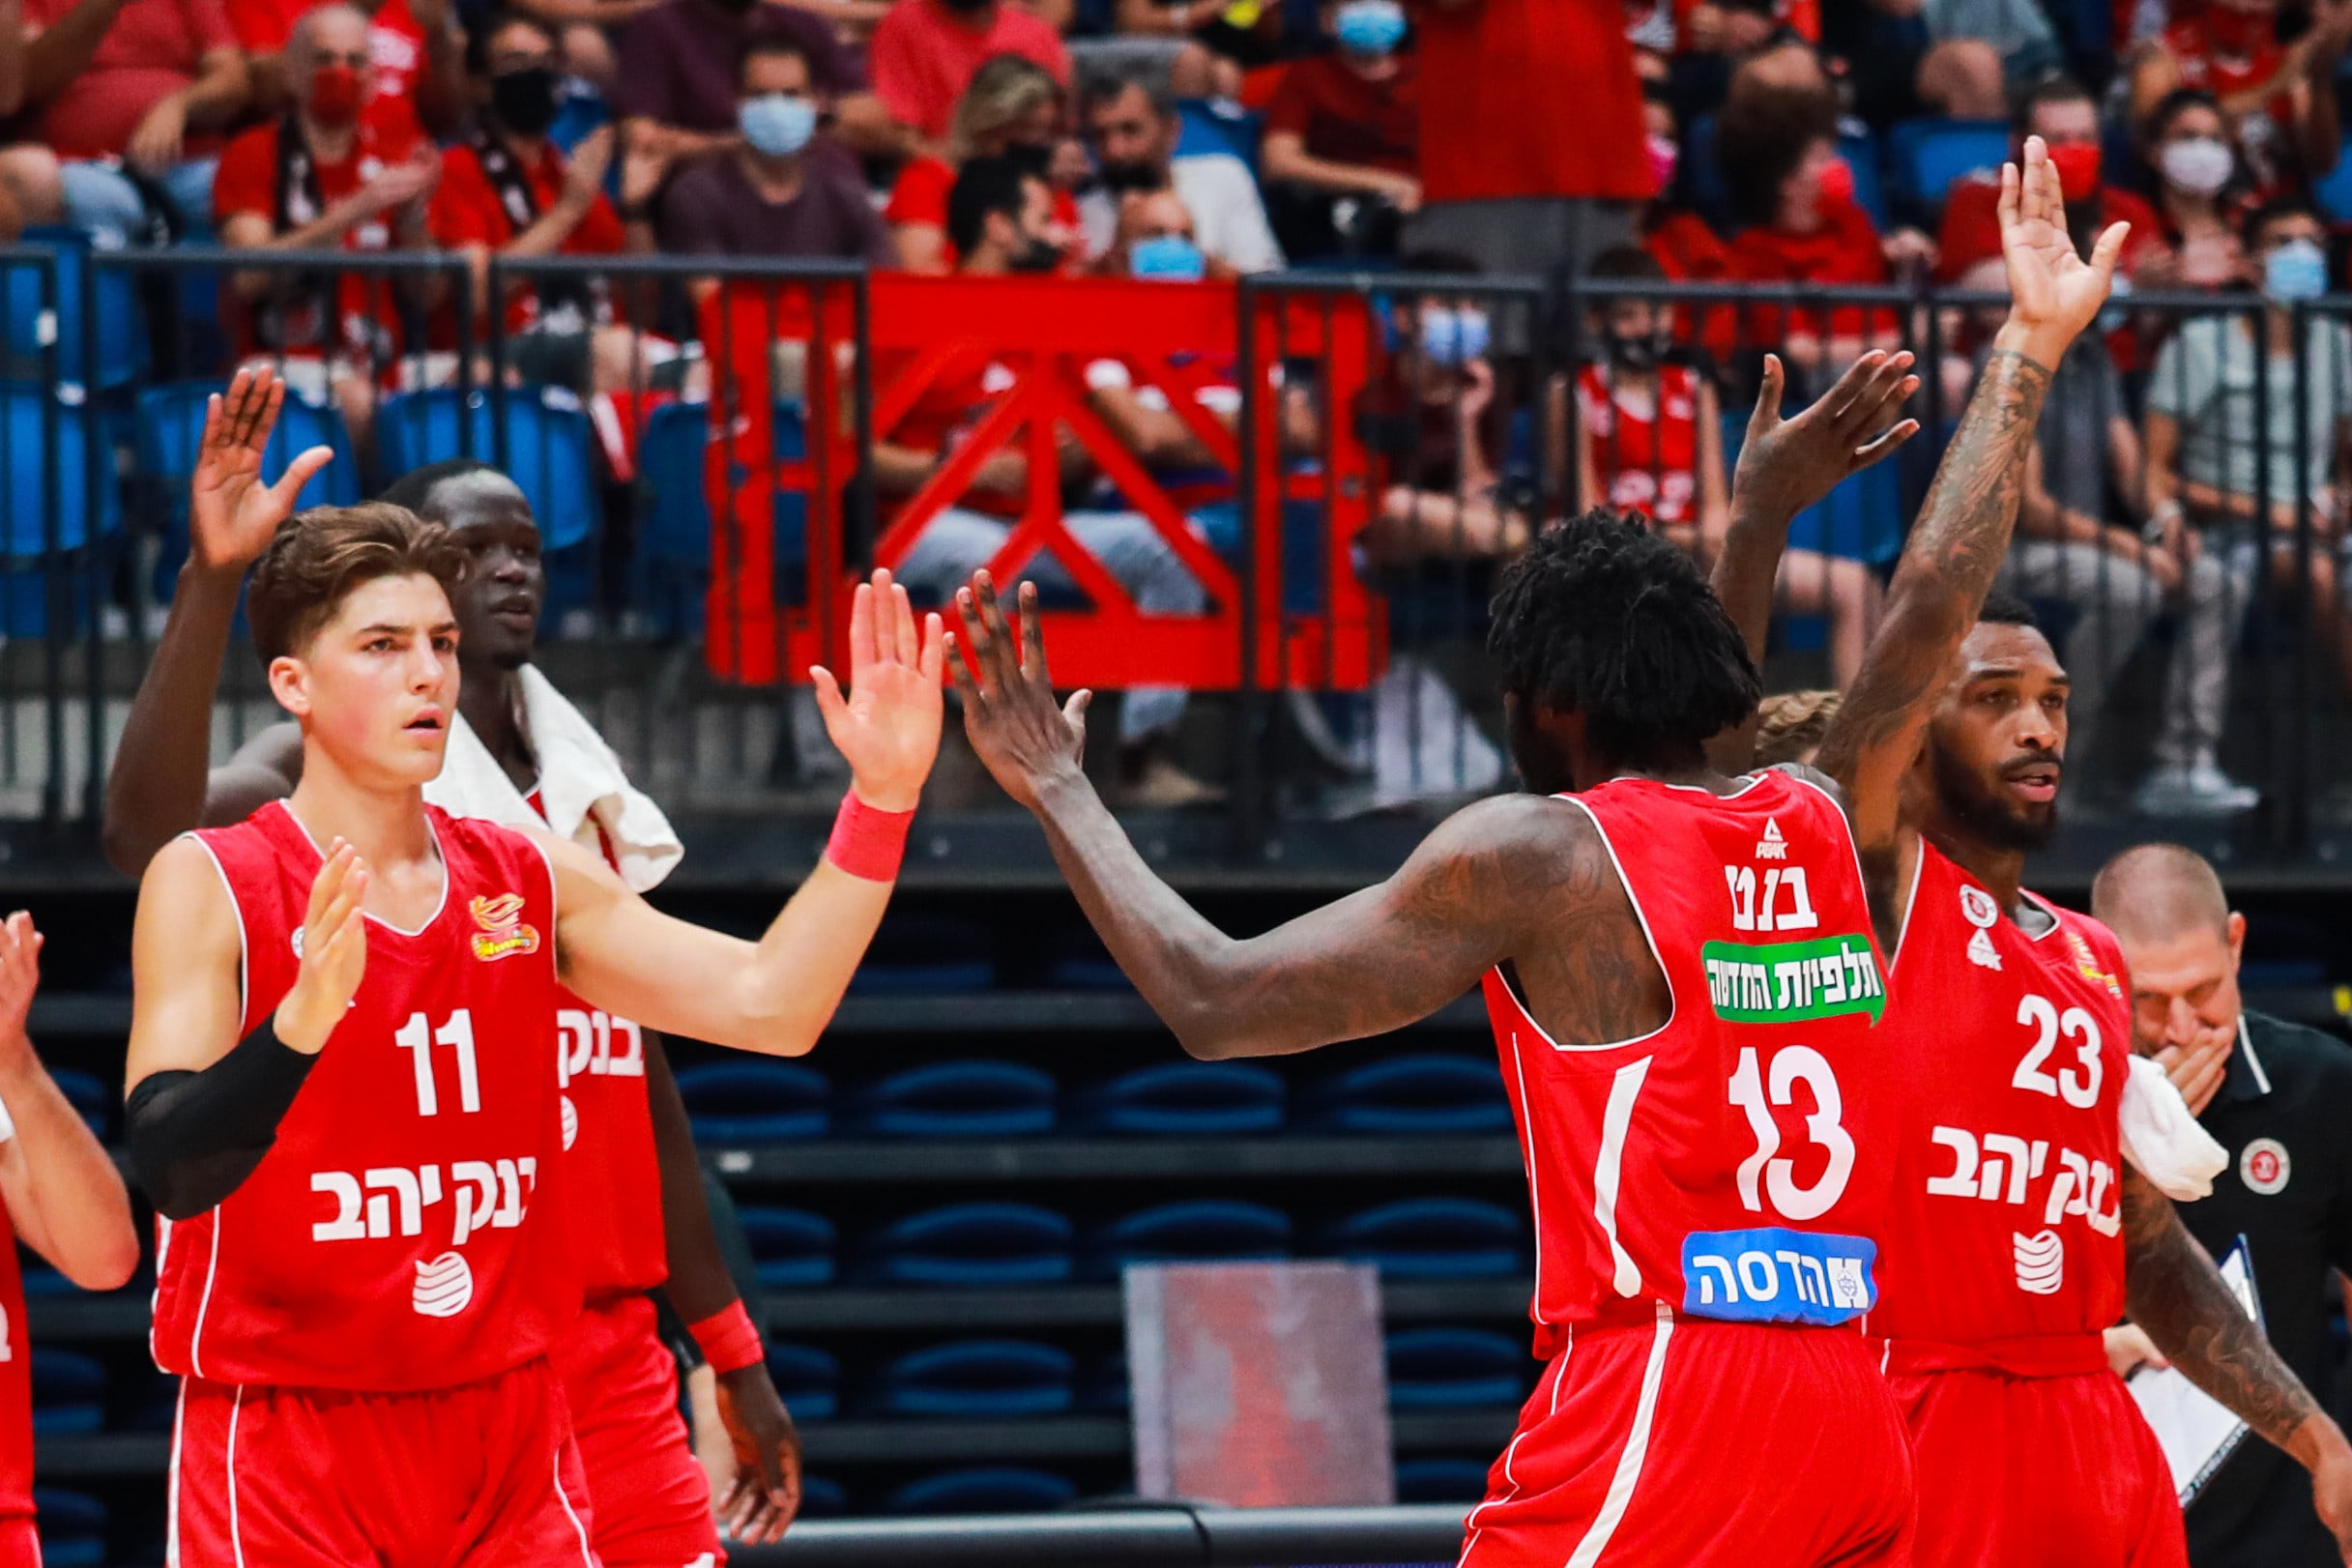 Hapoel Jerusalem players Adam Ariel, Anthony Bennett, Sean Kilpatrick are celebrating